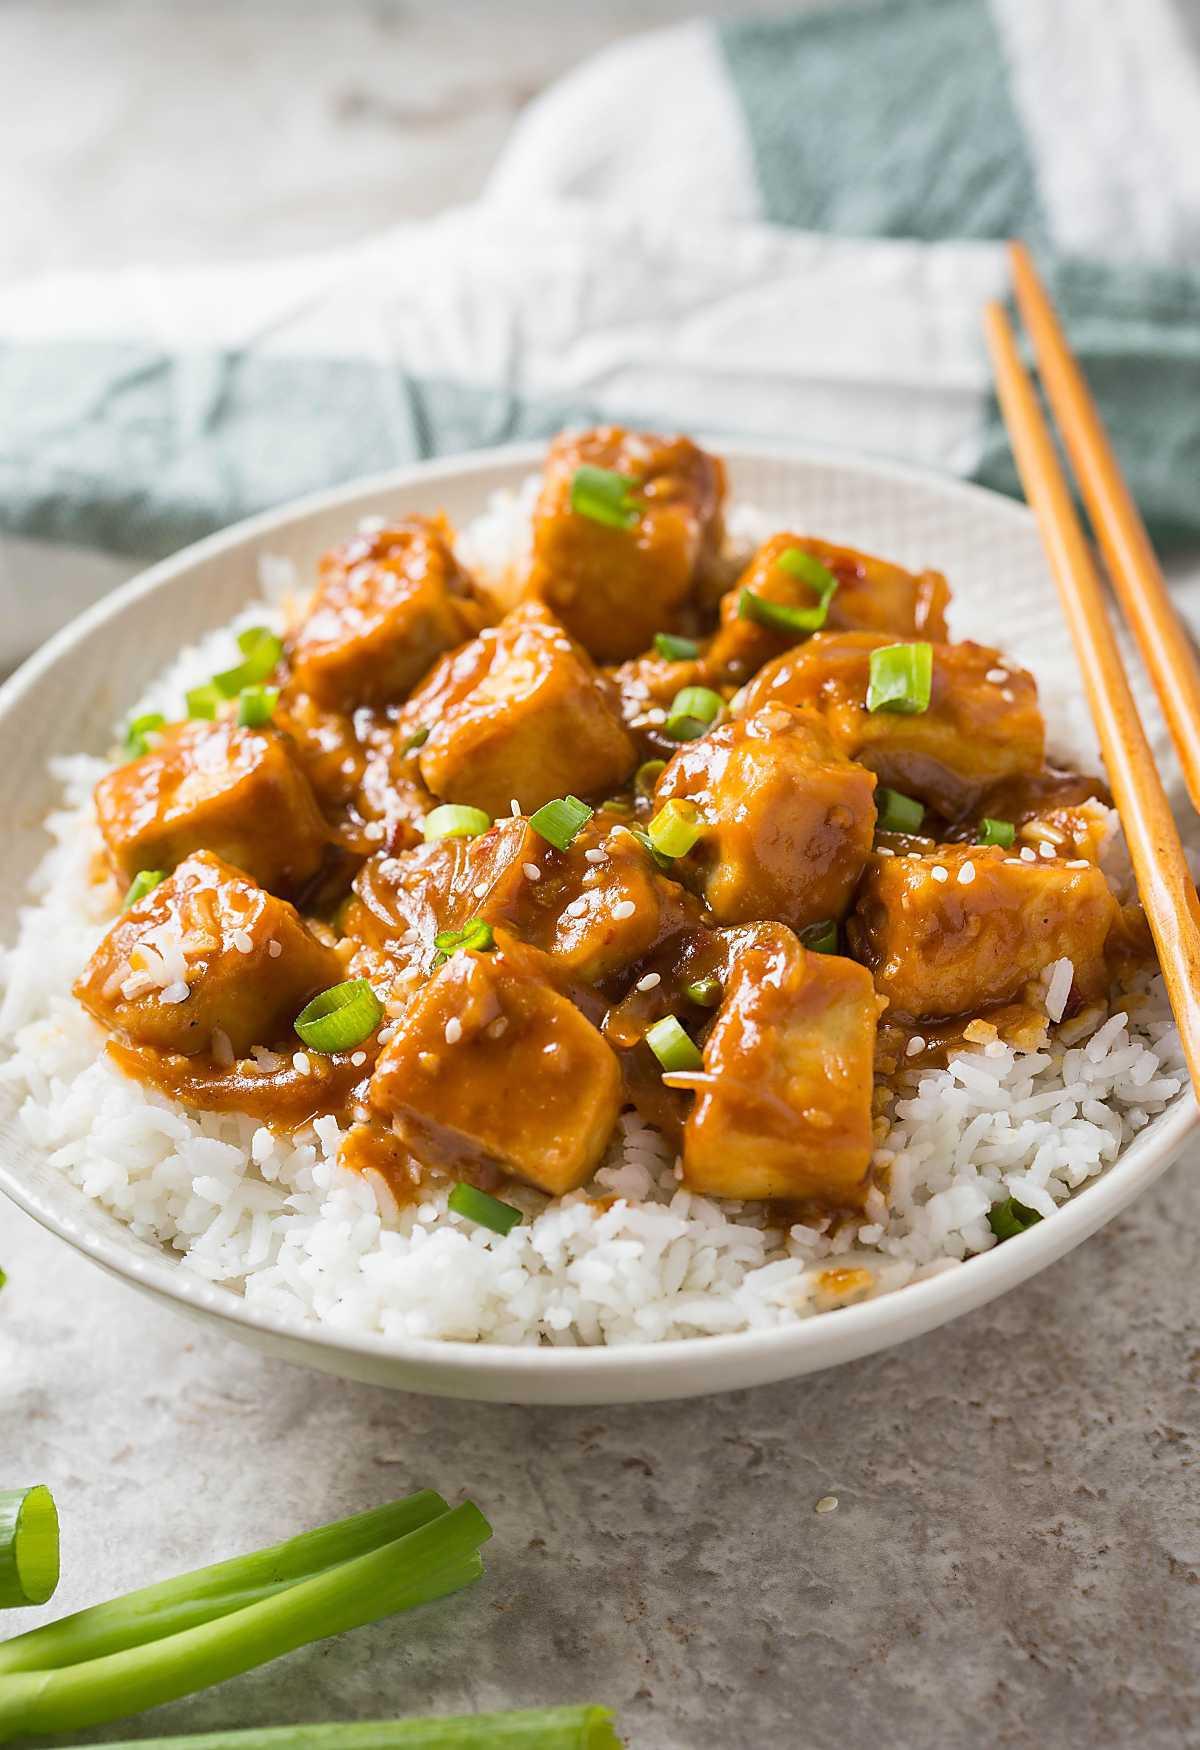 Soft Tofu Recipes  30 min Healthy Asian chili garlic tofu stir fry e Pan